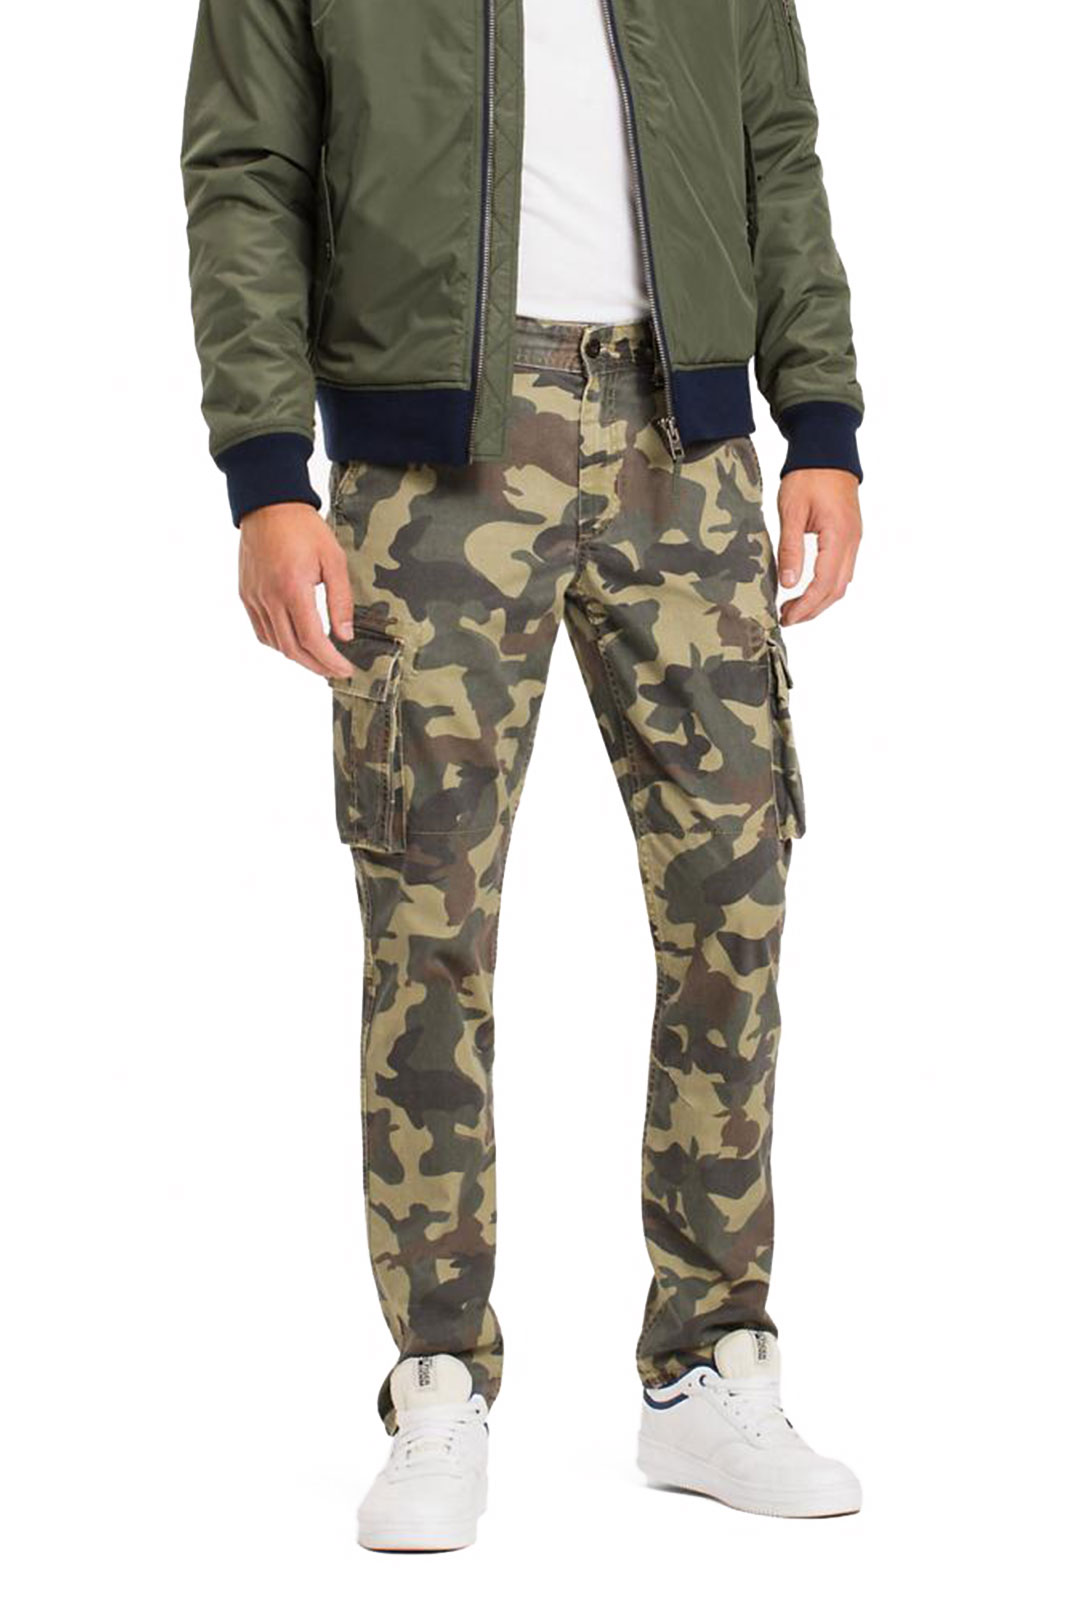 Pantalons sport/streetwear  Tommy Jeans DM0DM03708017 017 CAMO PRINT